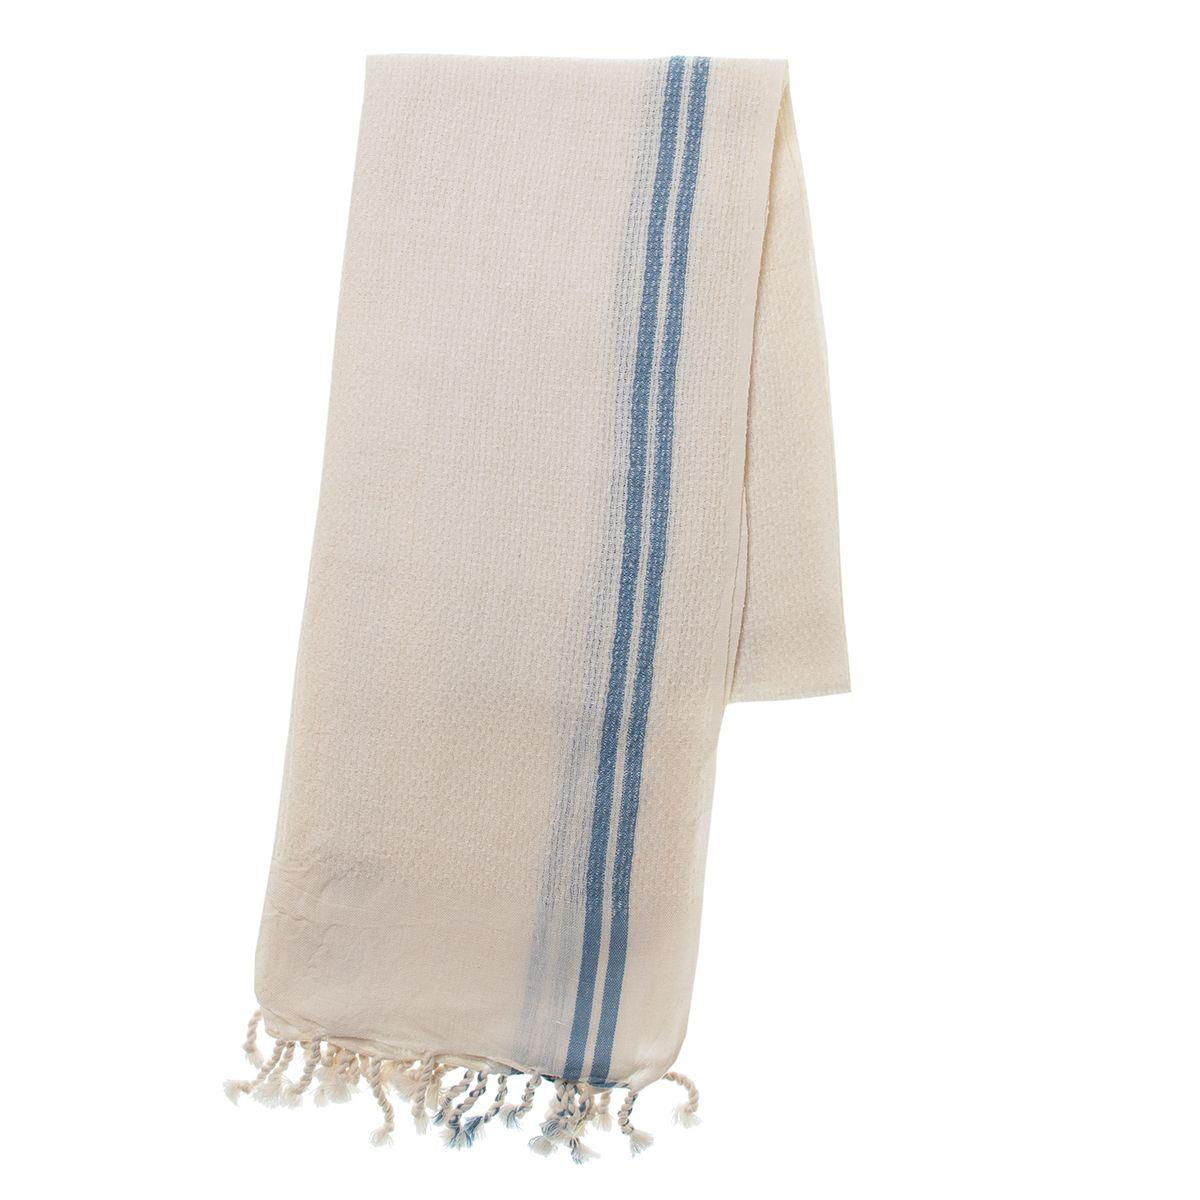 Peshtemal Petek / Ecru - Air Blue Stripes